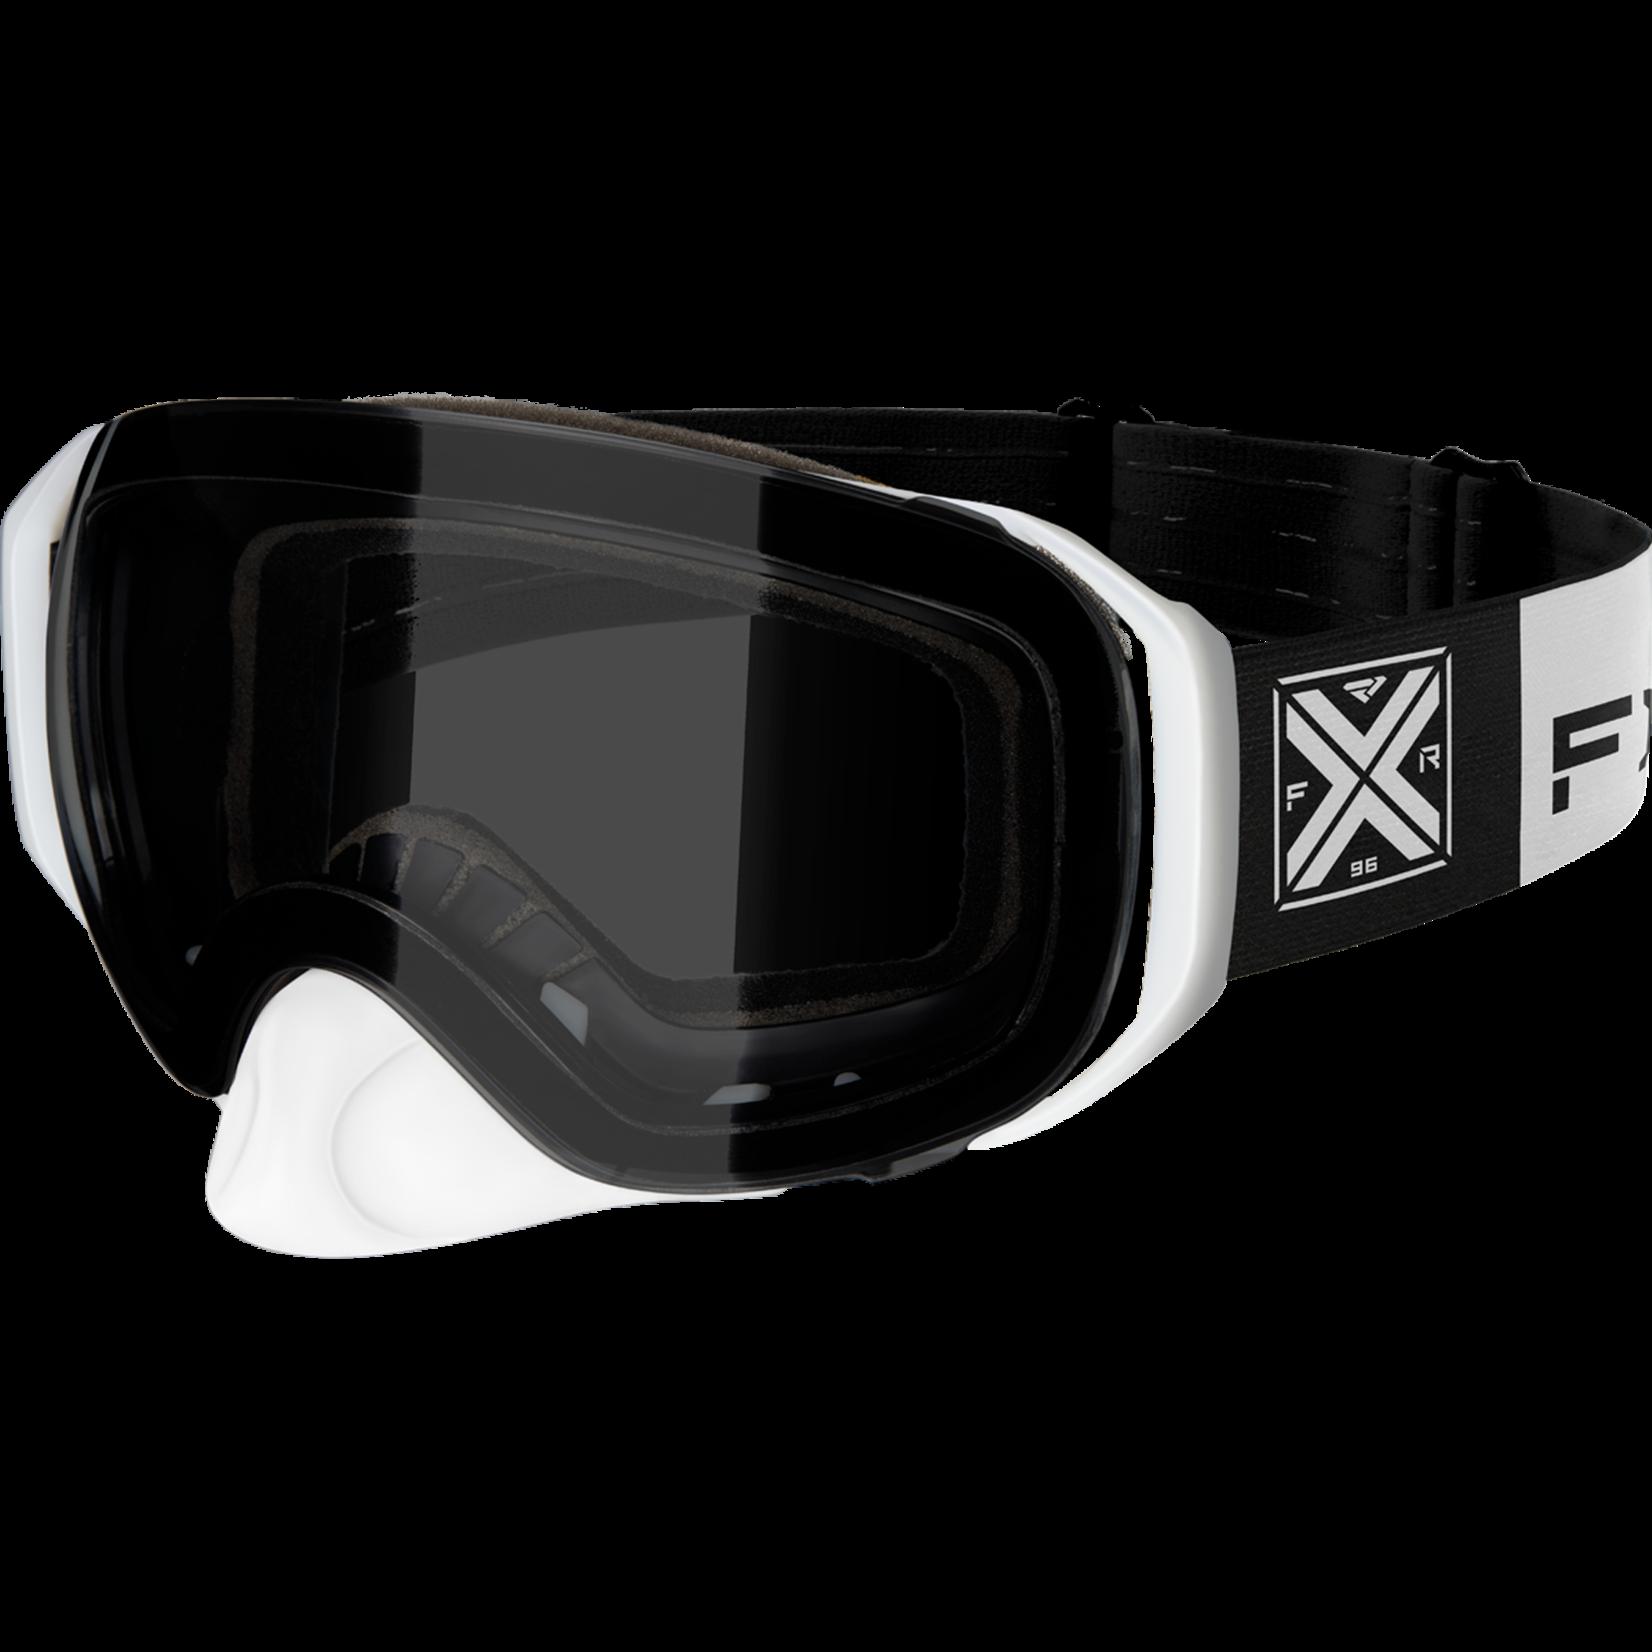 FXR Summit Spherical Goggle - Black/WHITE - OS